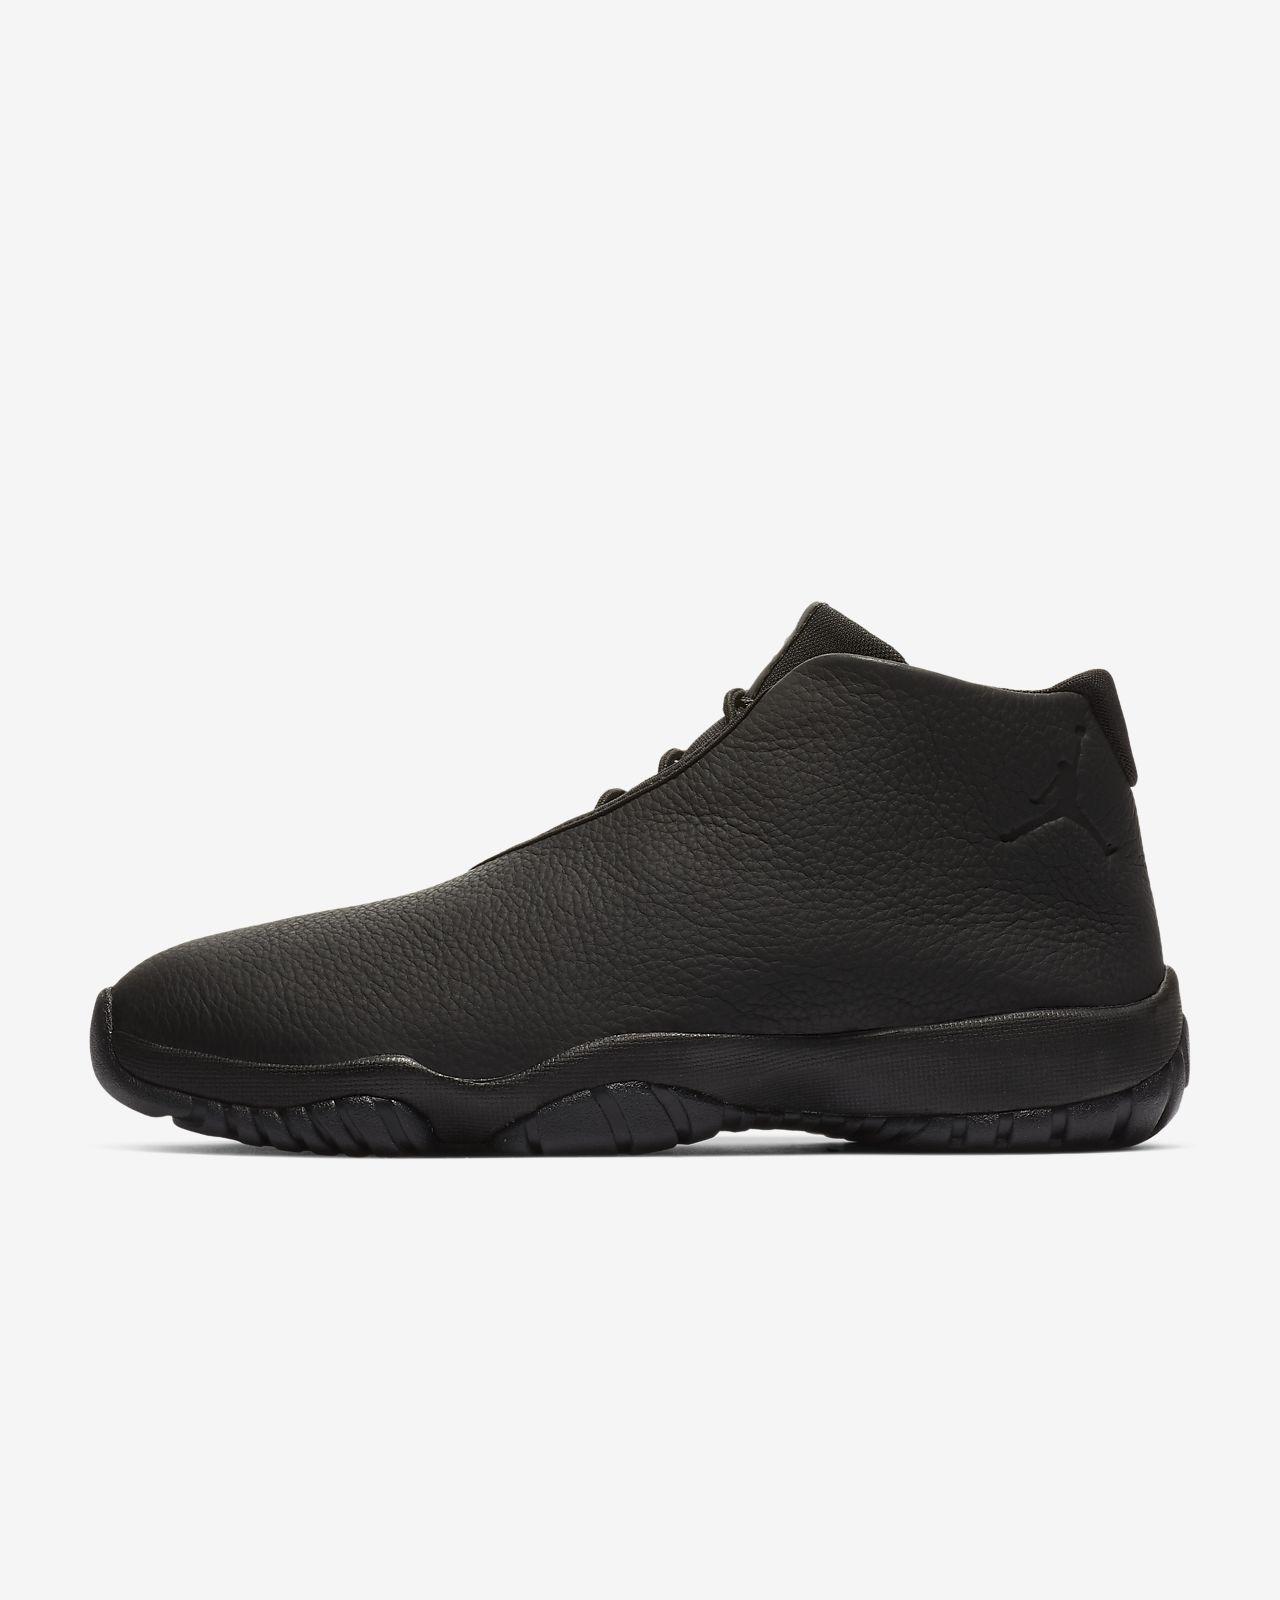 Calzado para hombre Air Jordan Future